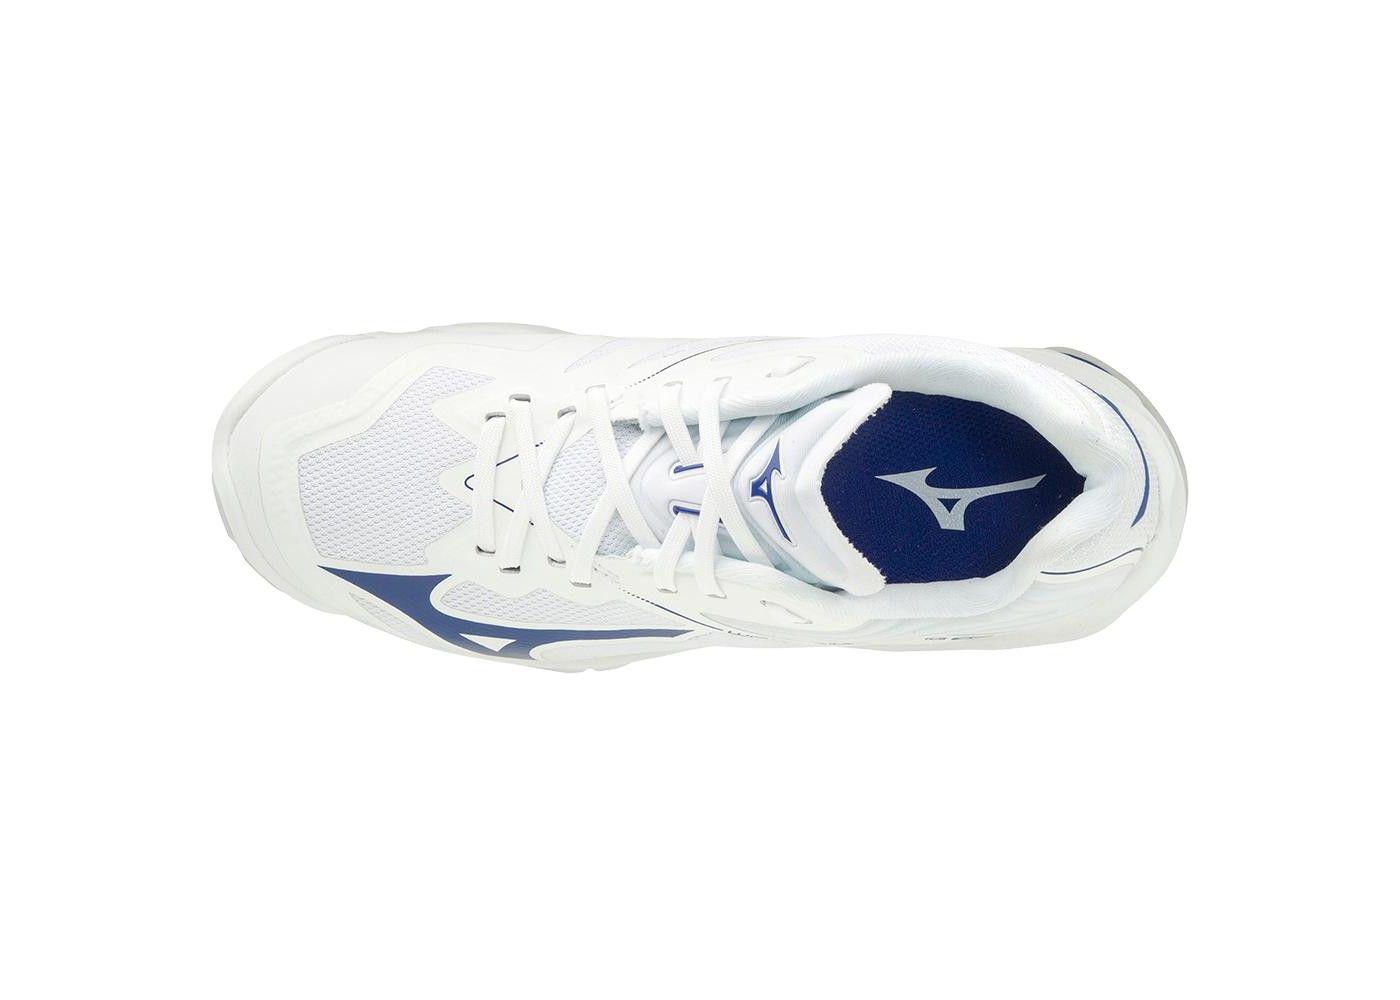 Mizuno Women S Wave Lightning Z6 Volleyball Shoe In 2020 Volleyball Shoes Mizuno Shoes